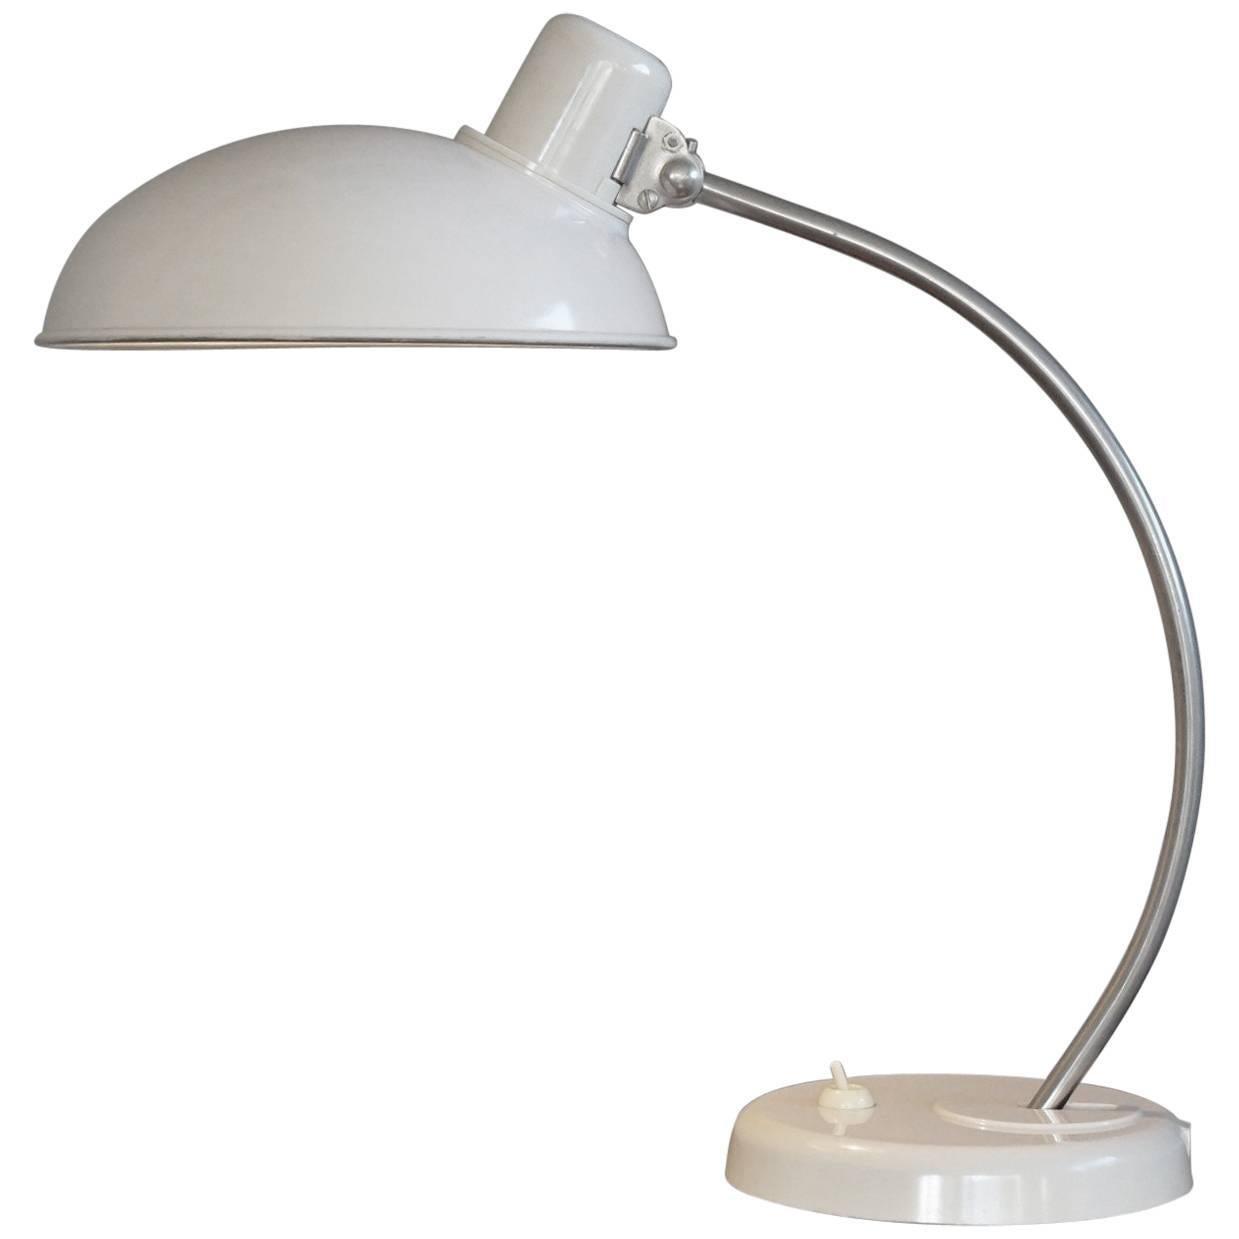 Rare & Highly Stylish Mid-Century Bauhaus Style White Bakelite Table / Desk Lamp